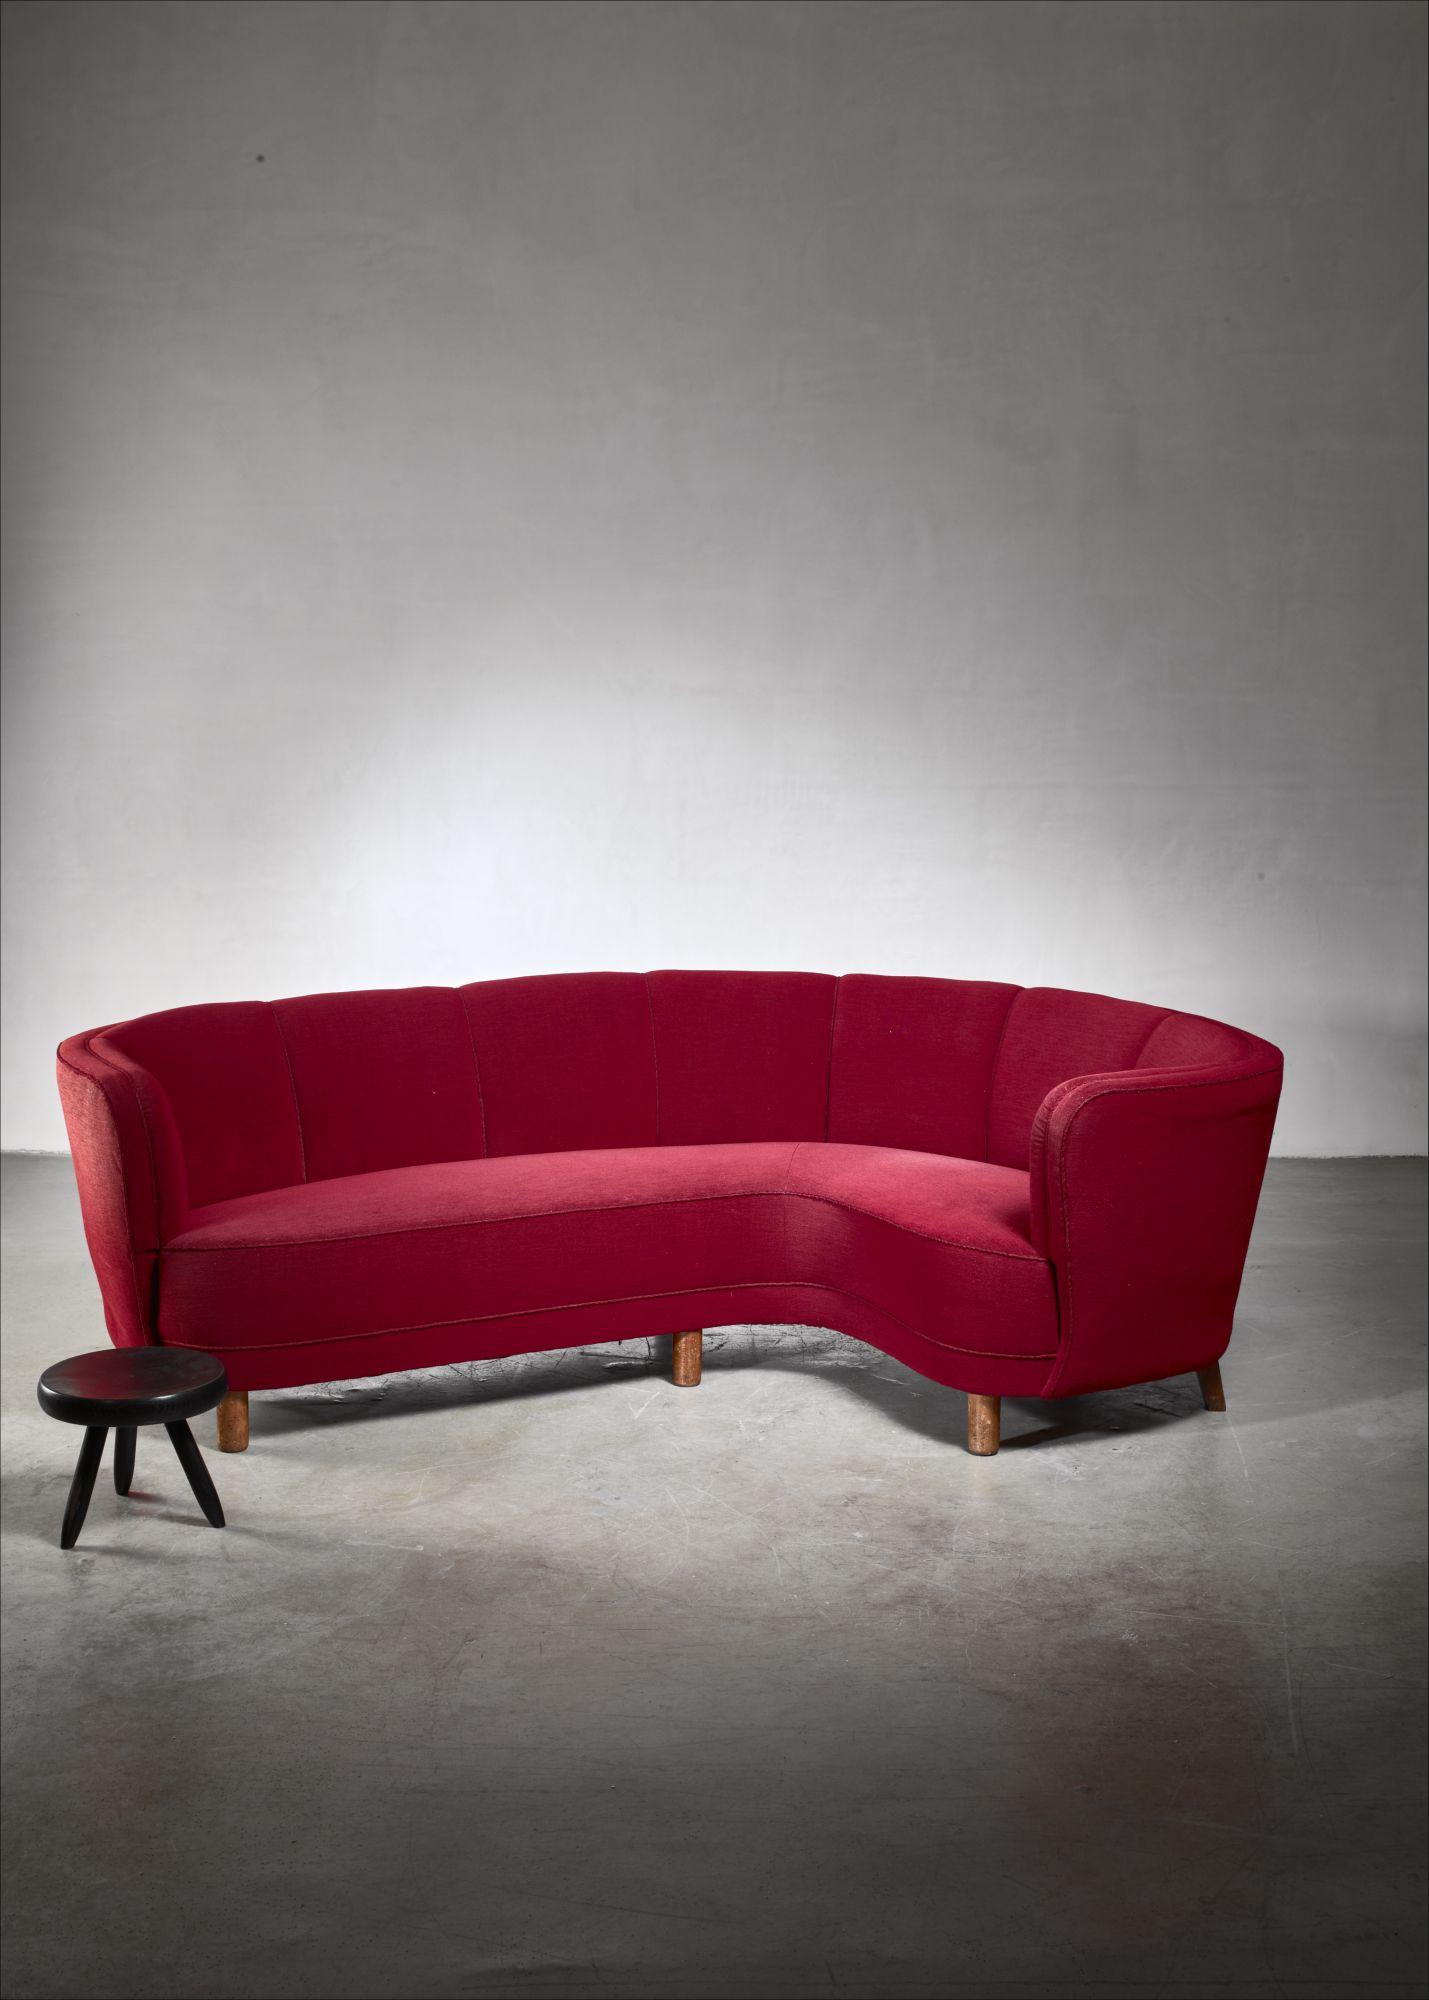 Dark red large Danish corner sofa, 1930s